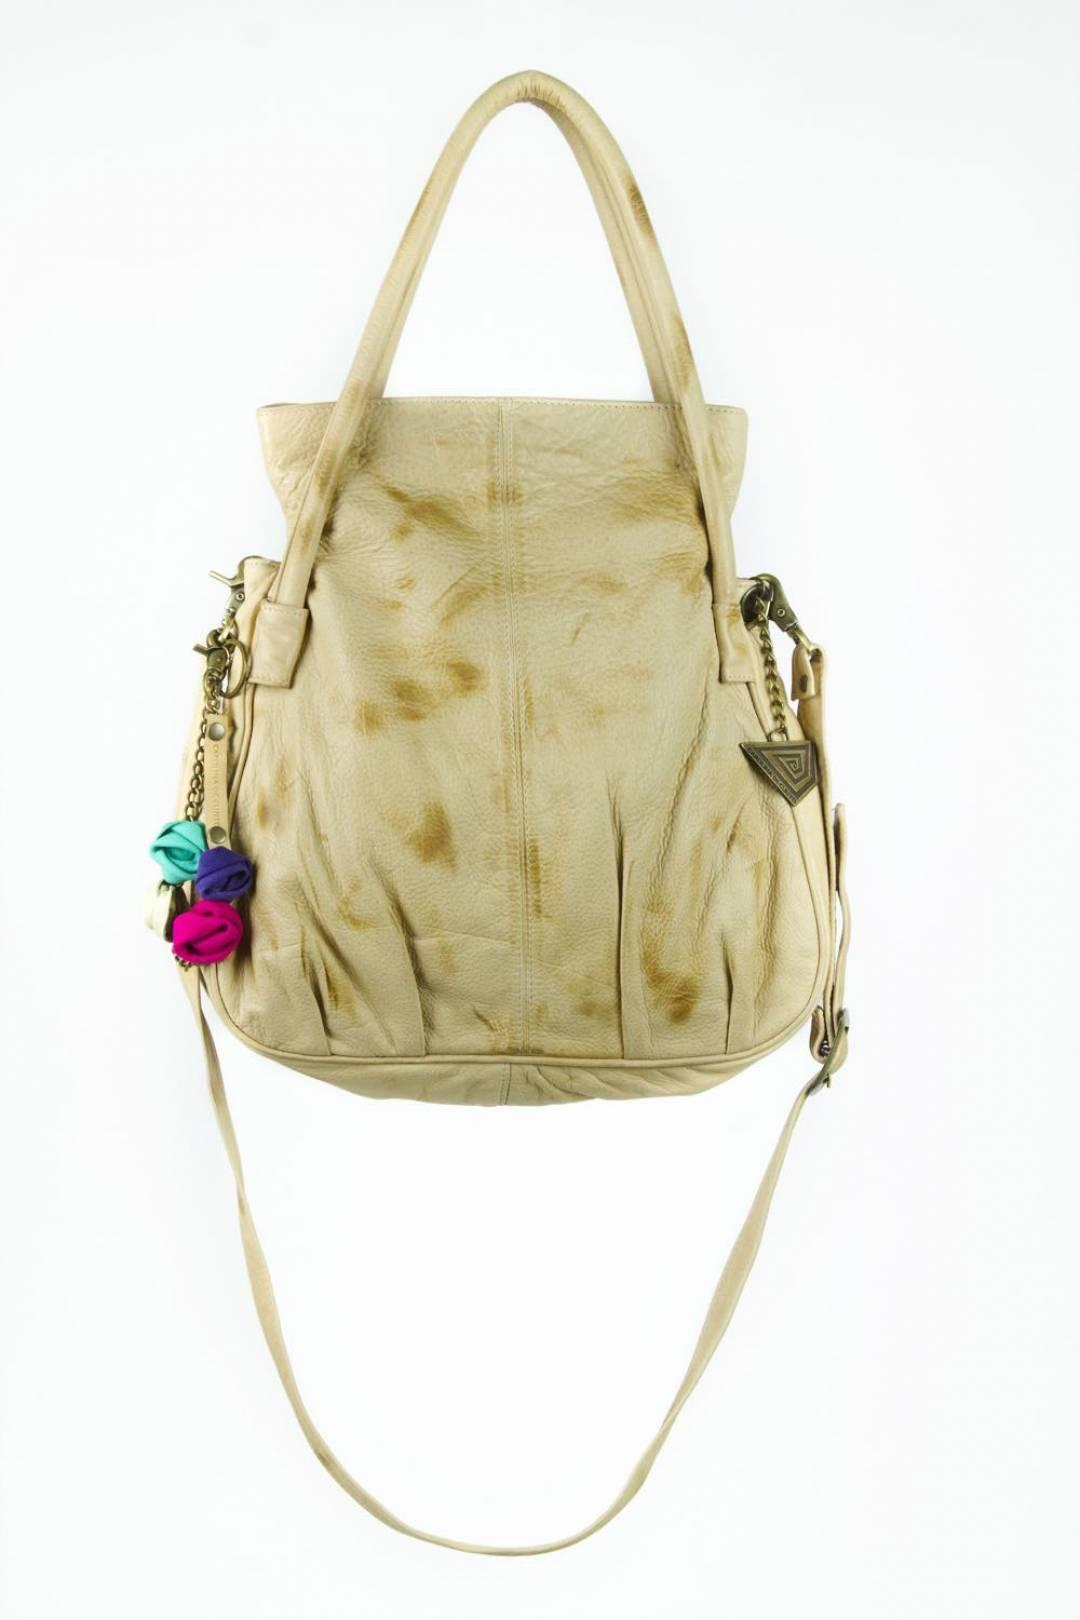 soft leather handbag in ivory color